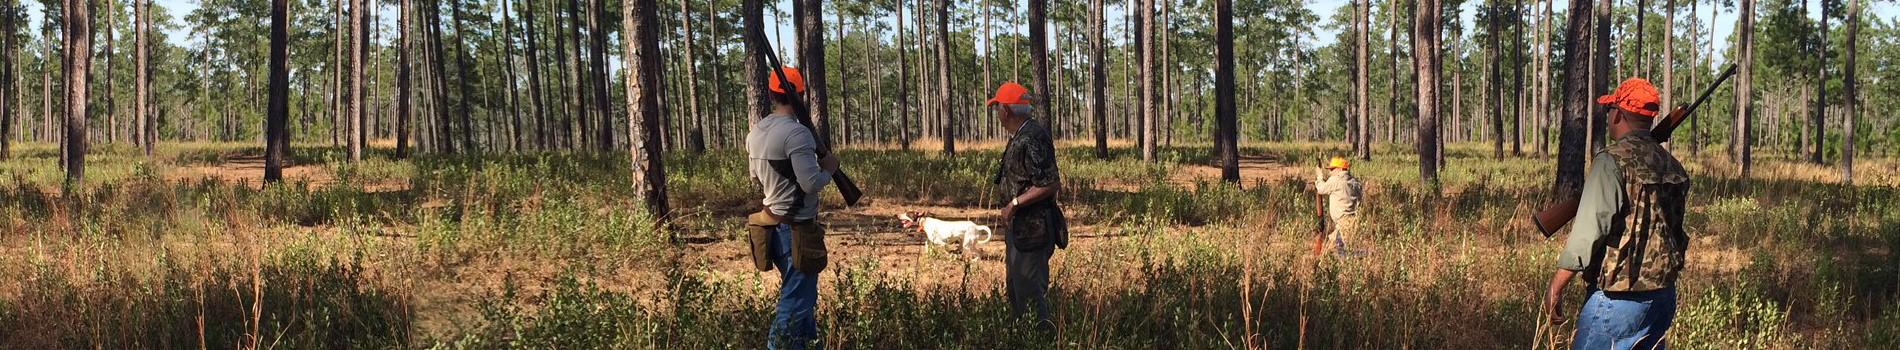 hunting on rural land